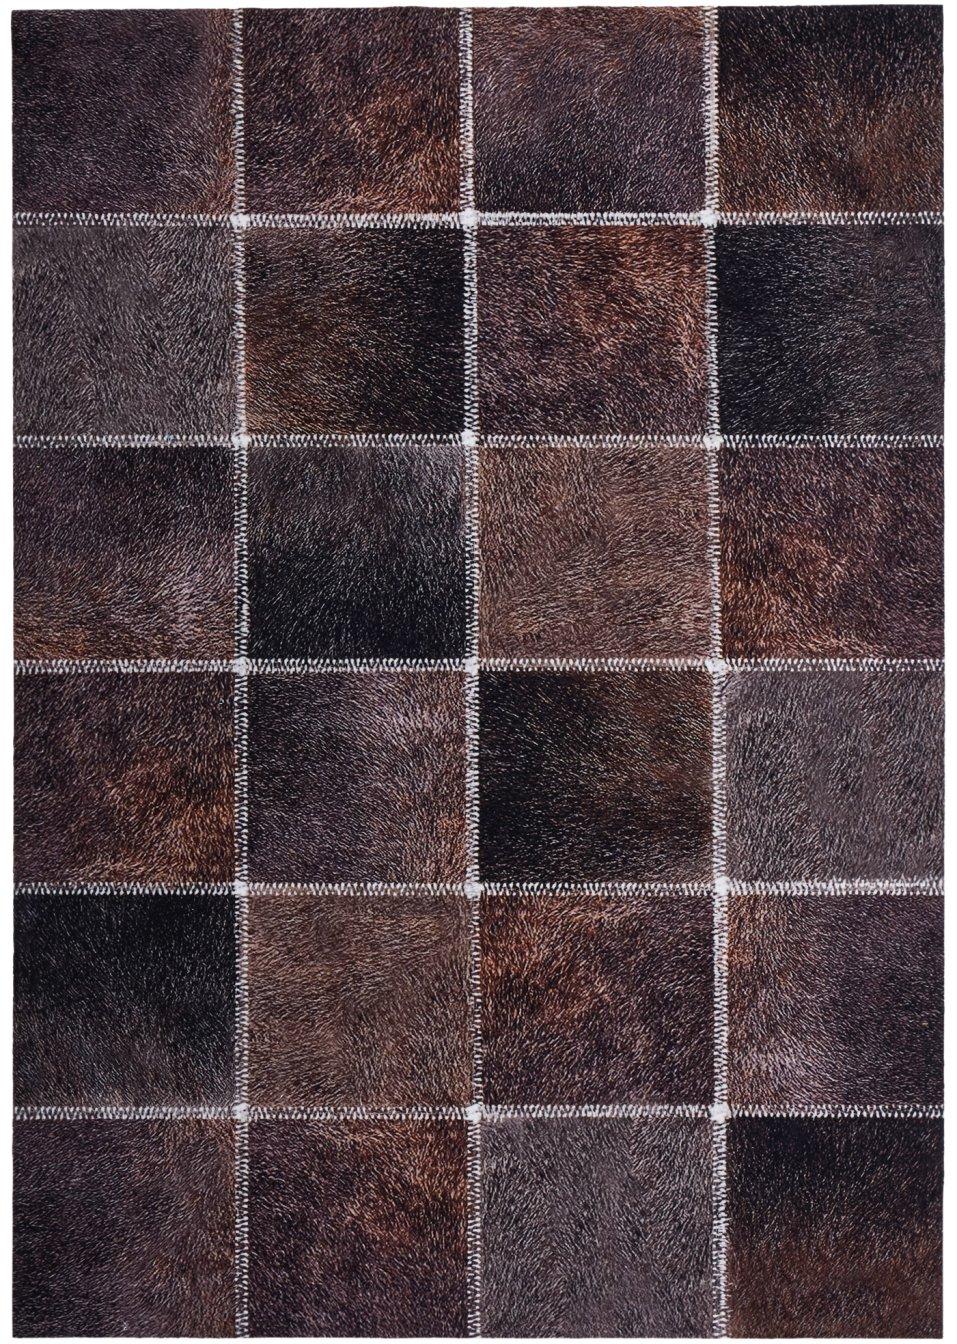 tapis imitation peau de b te marron imprim bpc living. Black Bedroom Furniture Sets. Home Design Ideas